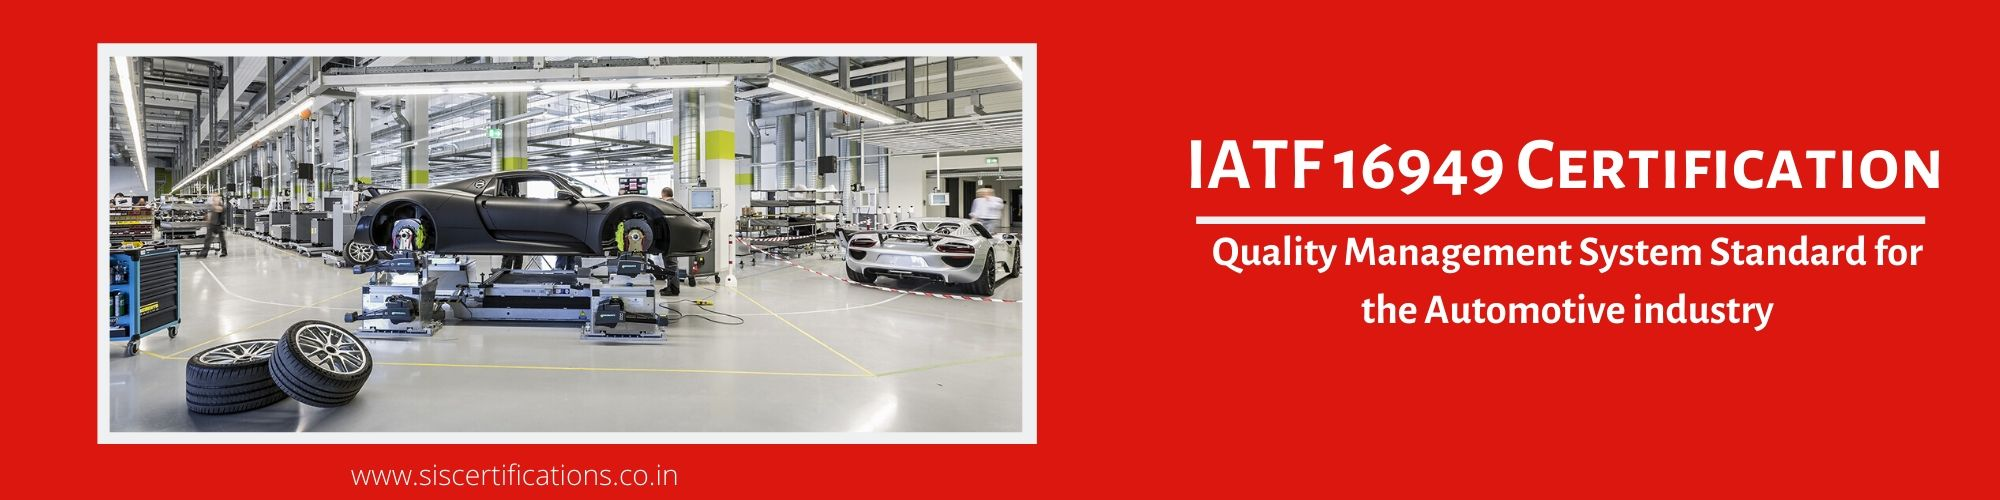 IATF 16949 Certification , IATF 16949 Certification